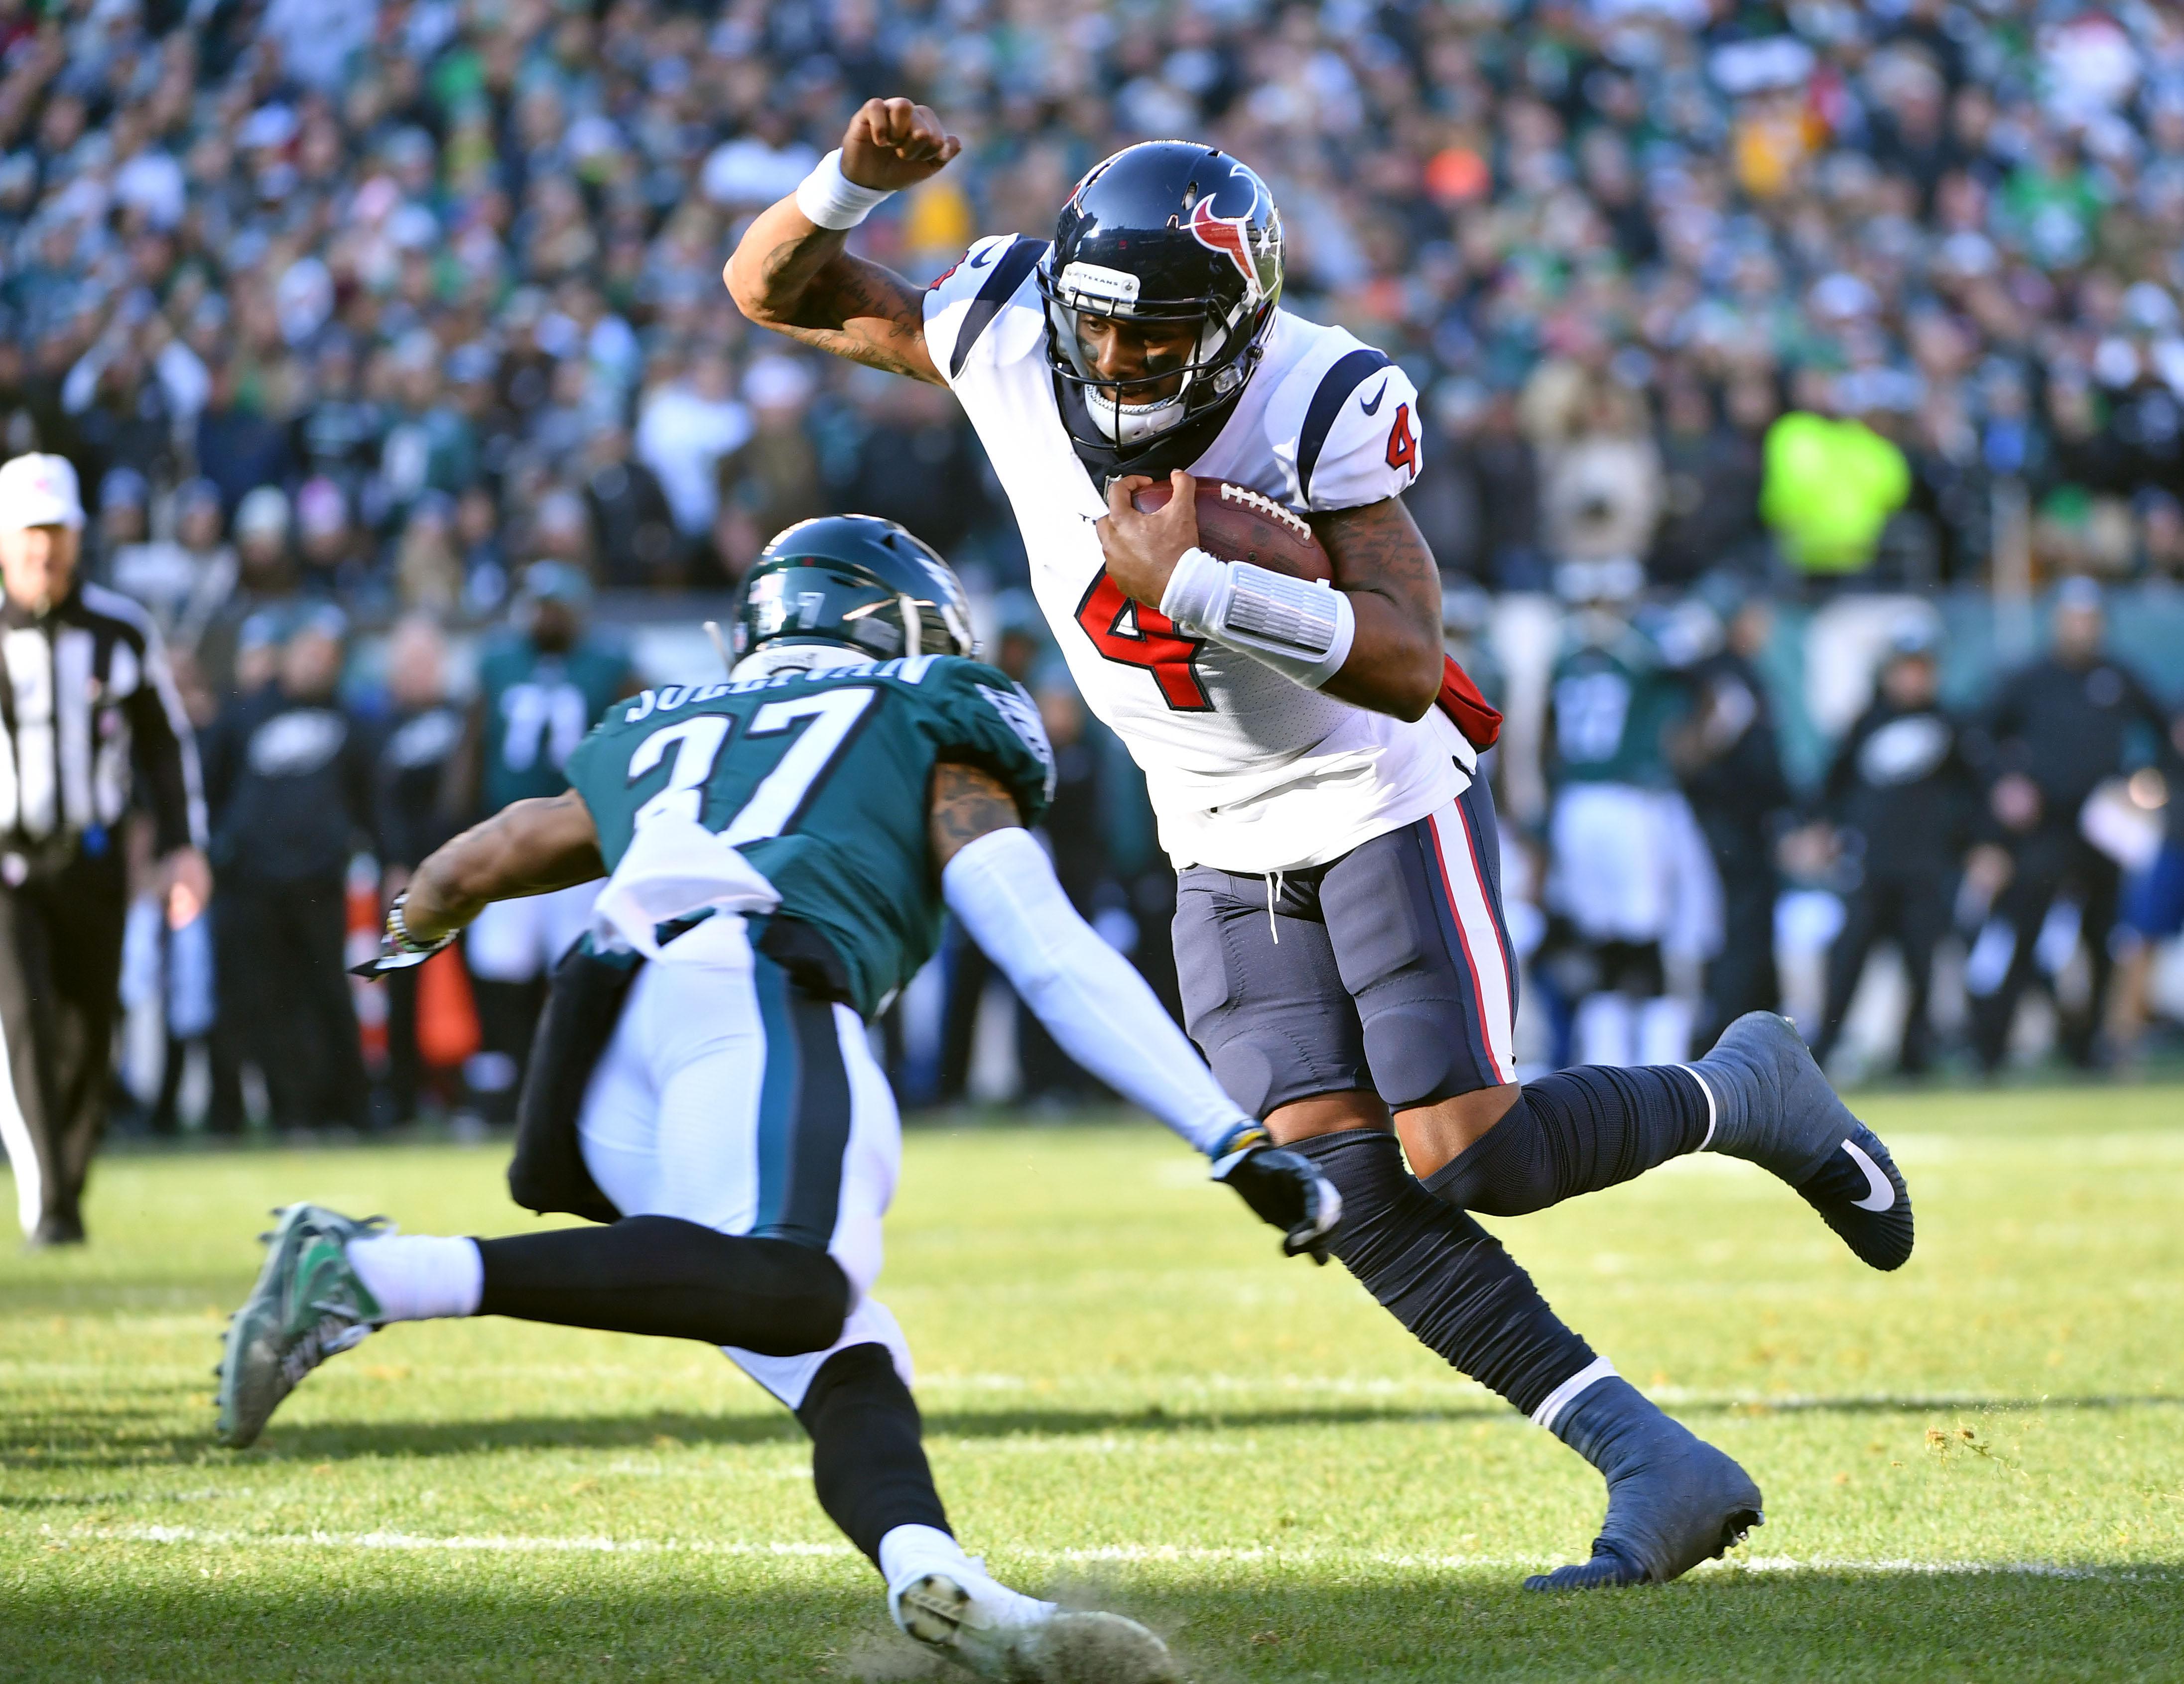 NFL: Houston Texans at Philadelphia Eagles